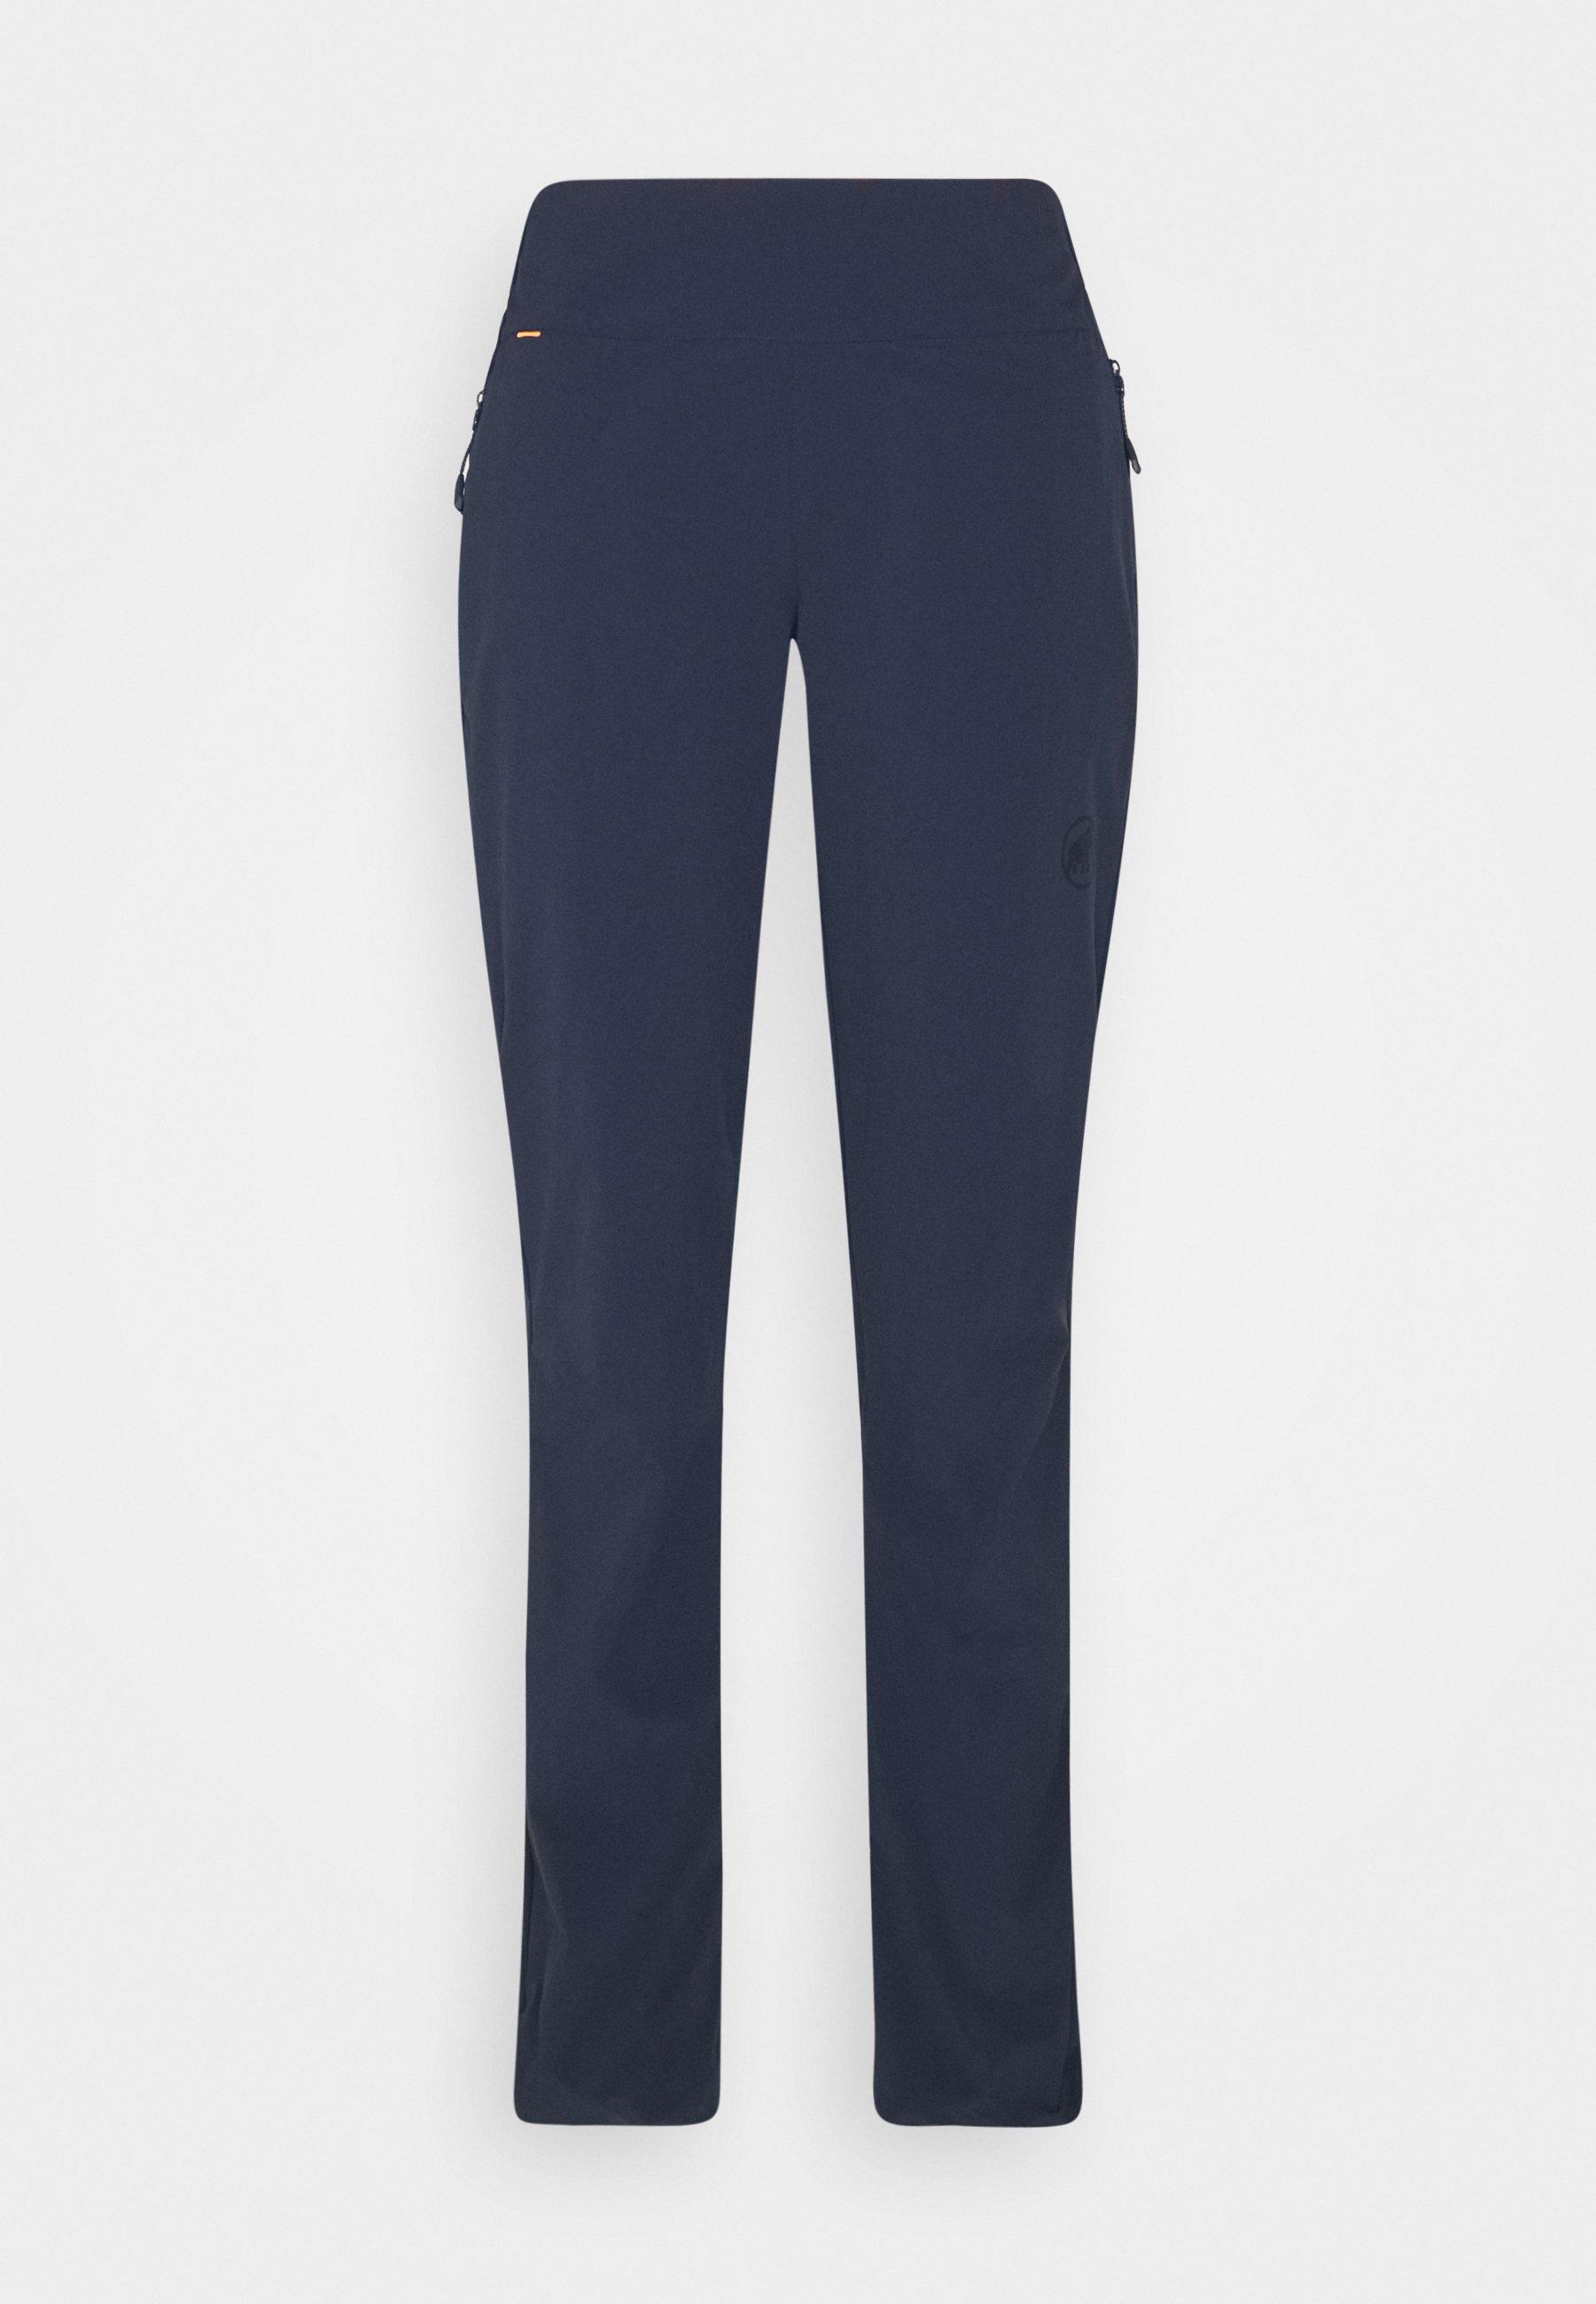 Femme RUNBOLD LIGHT PANTS WOMEN - Pantalon classique